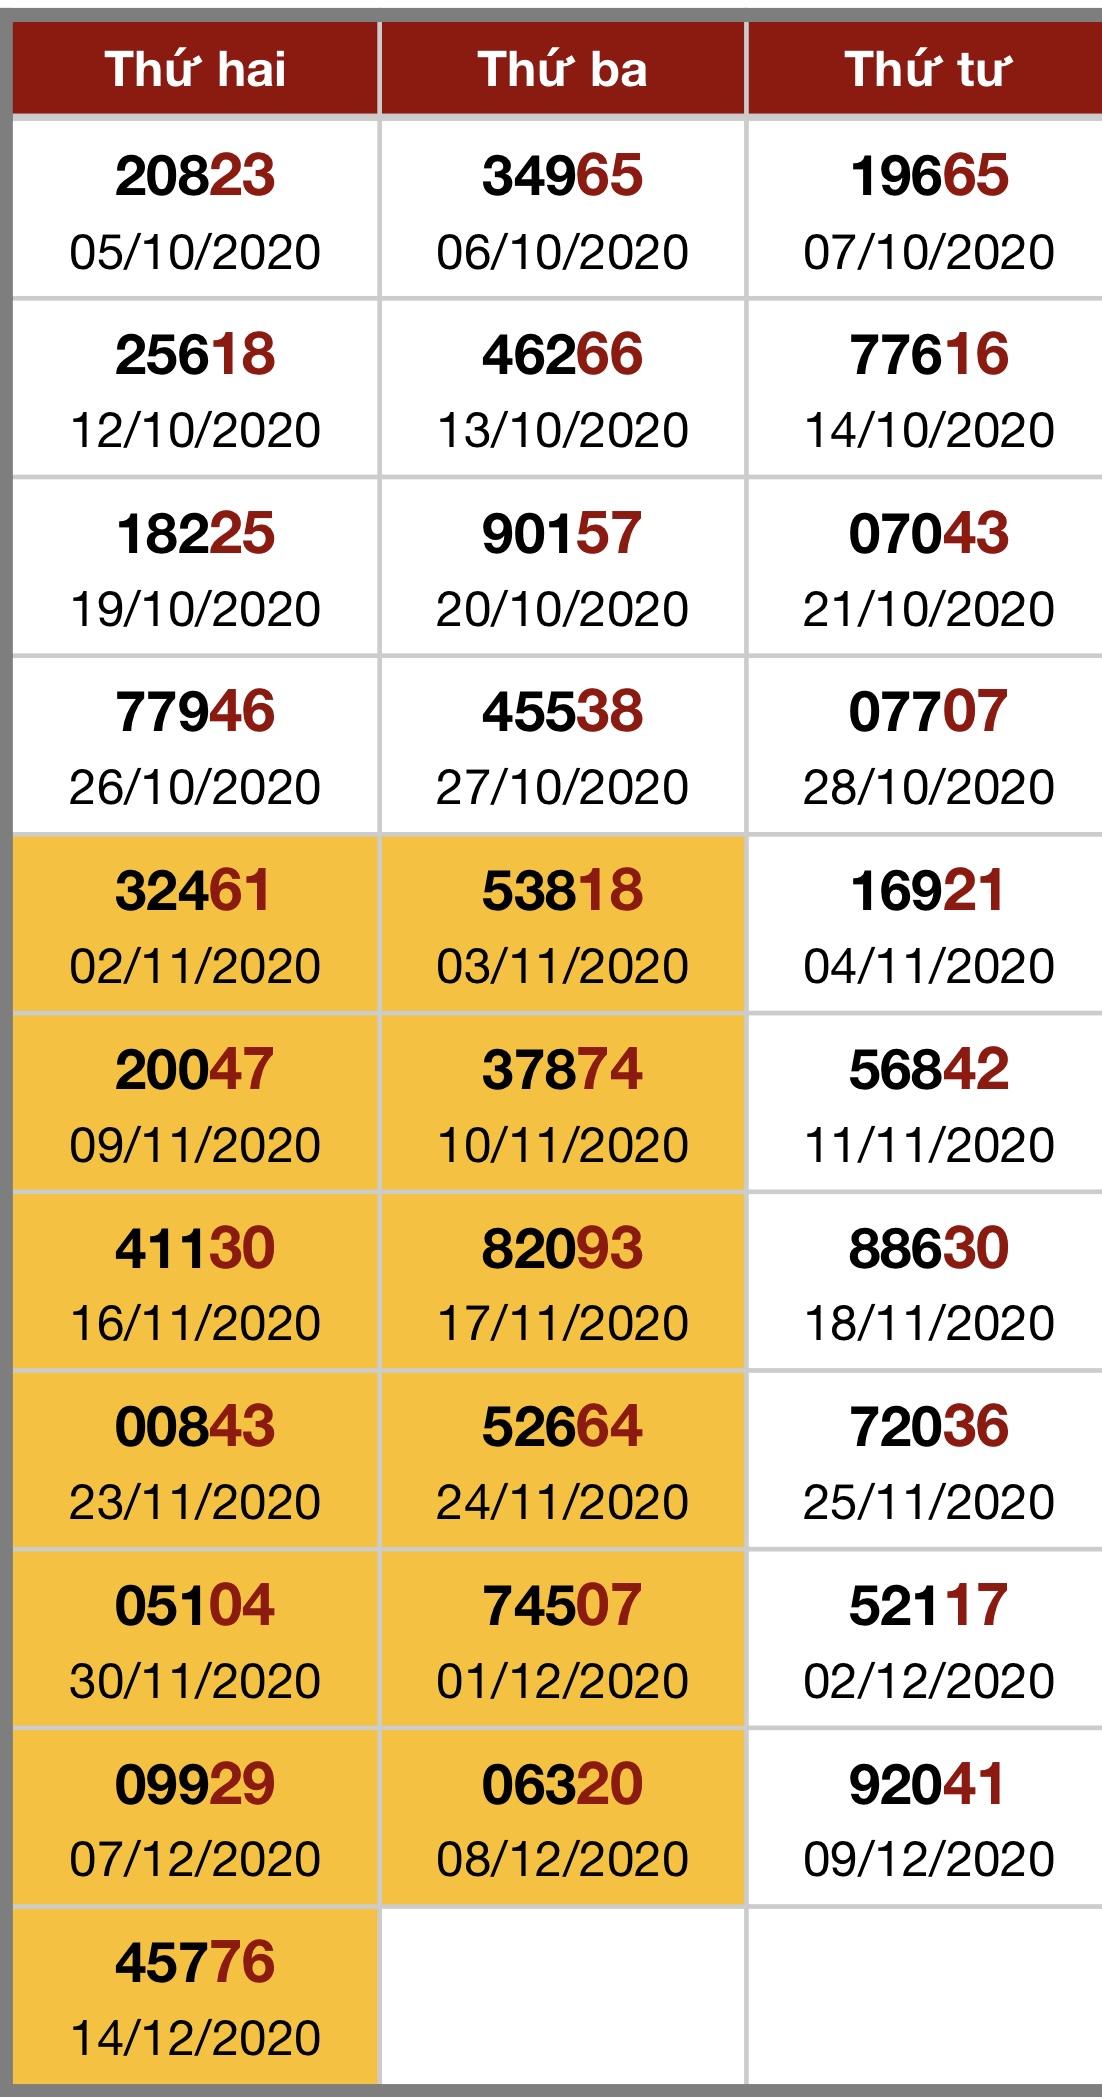 8733AB0D-6C55-4376-A05D-DF8E83ACF578.jpeg